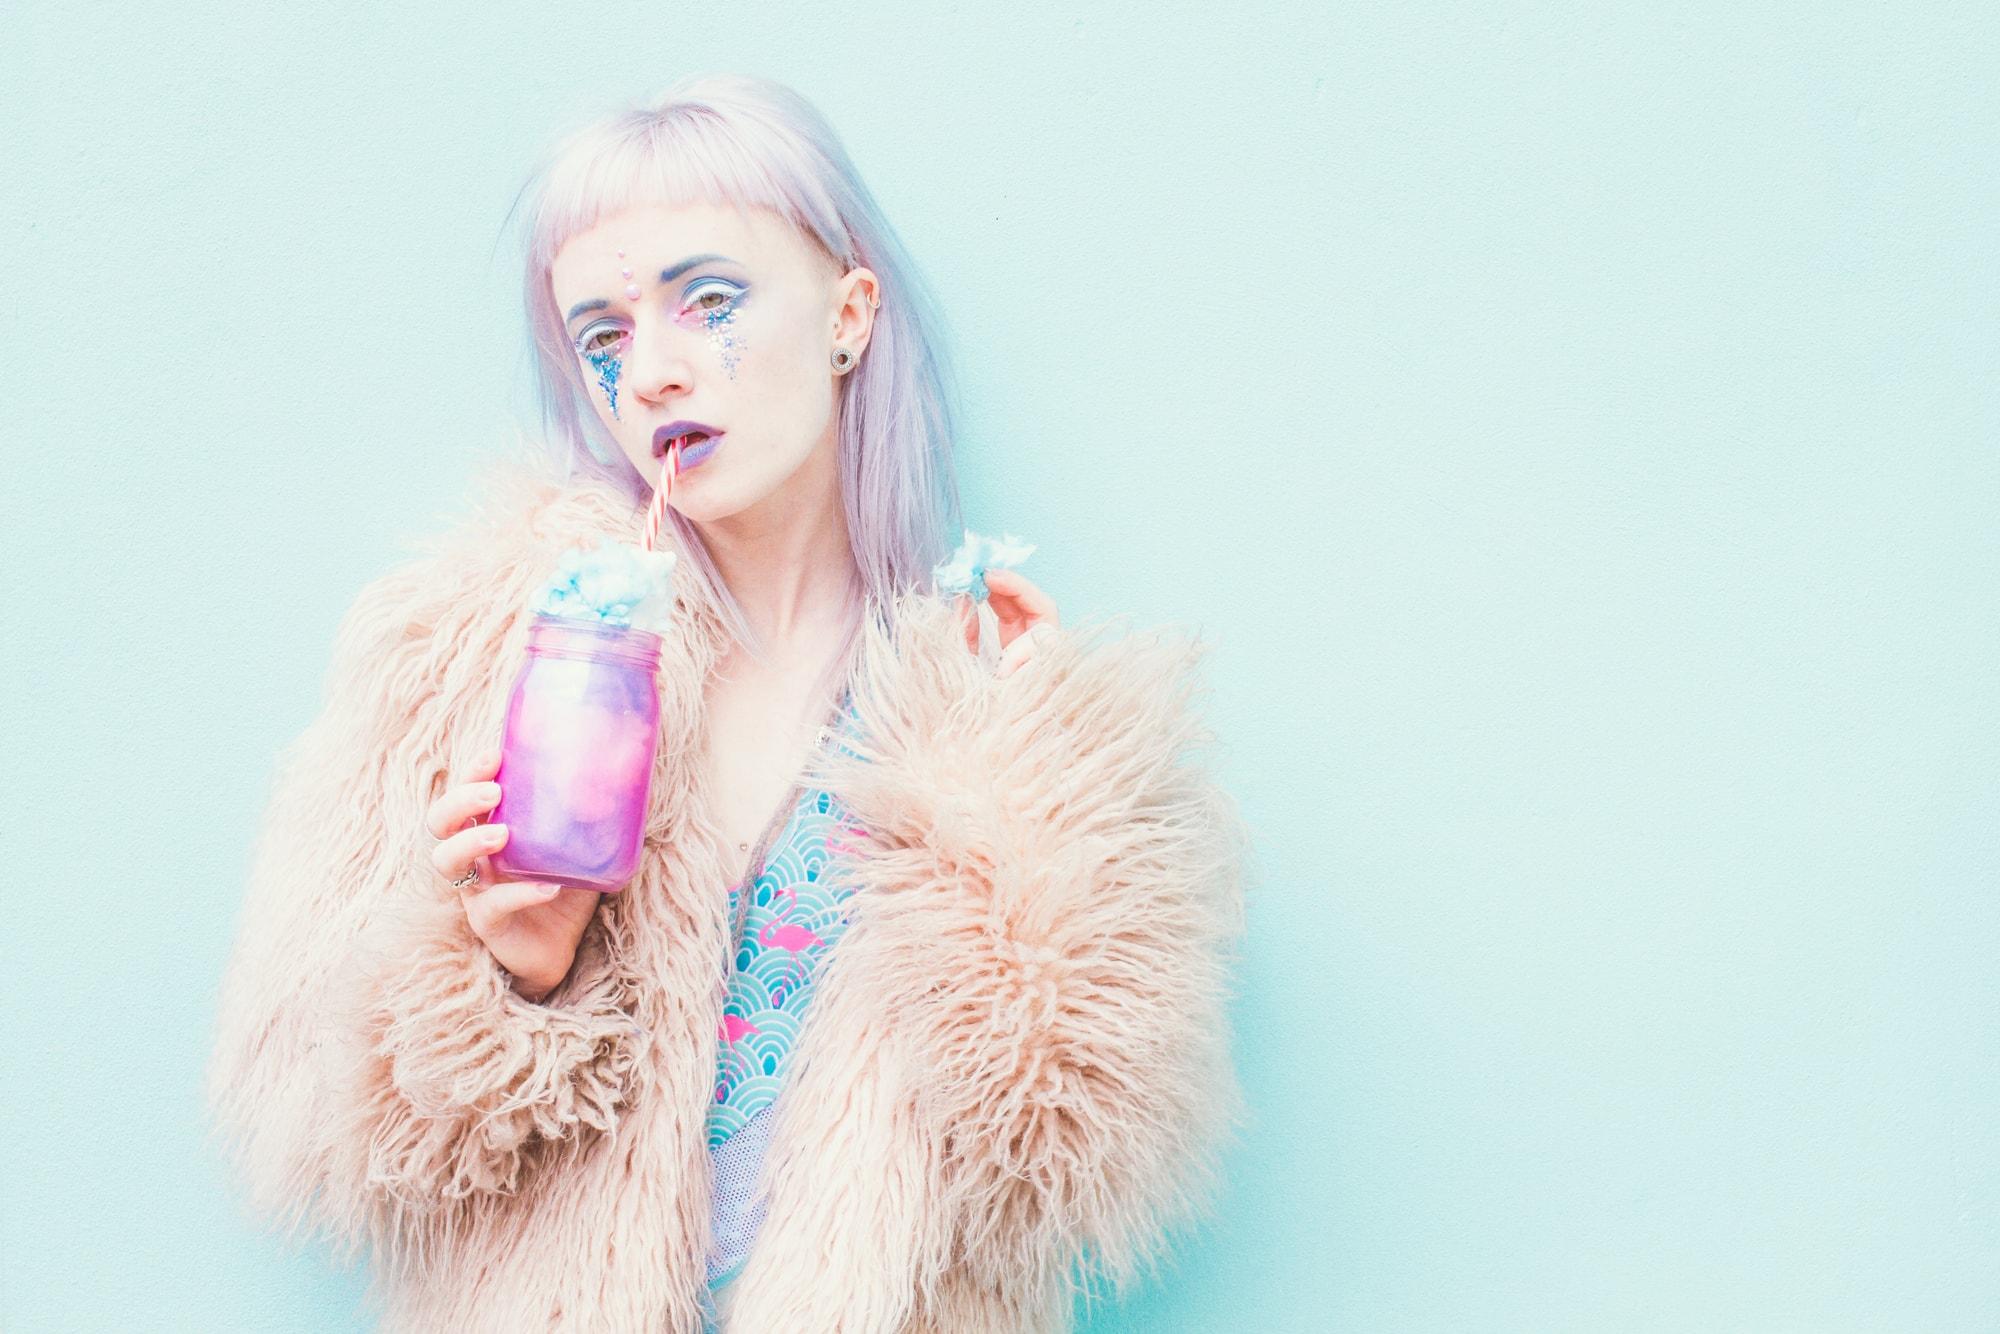 Maddy Fluer Portrait ©Leora Bermeister